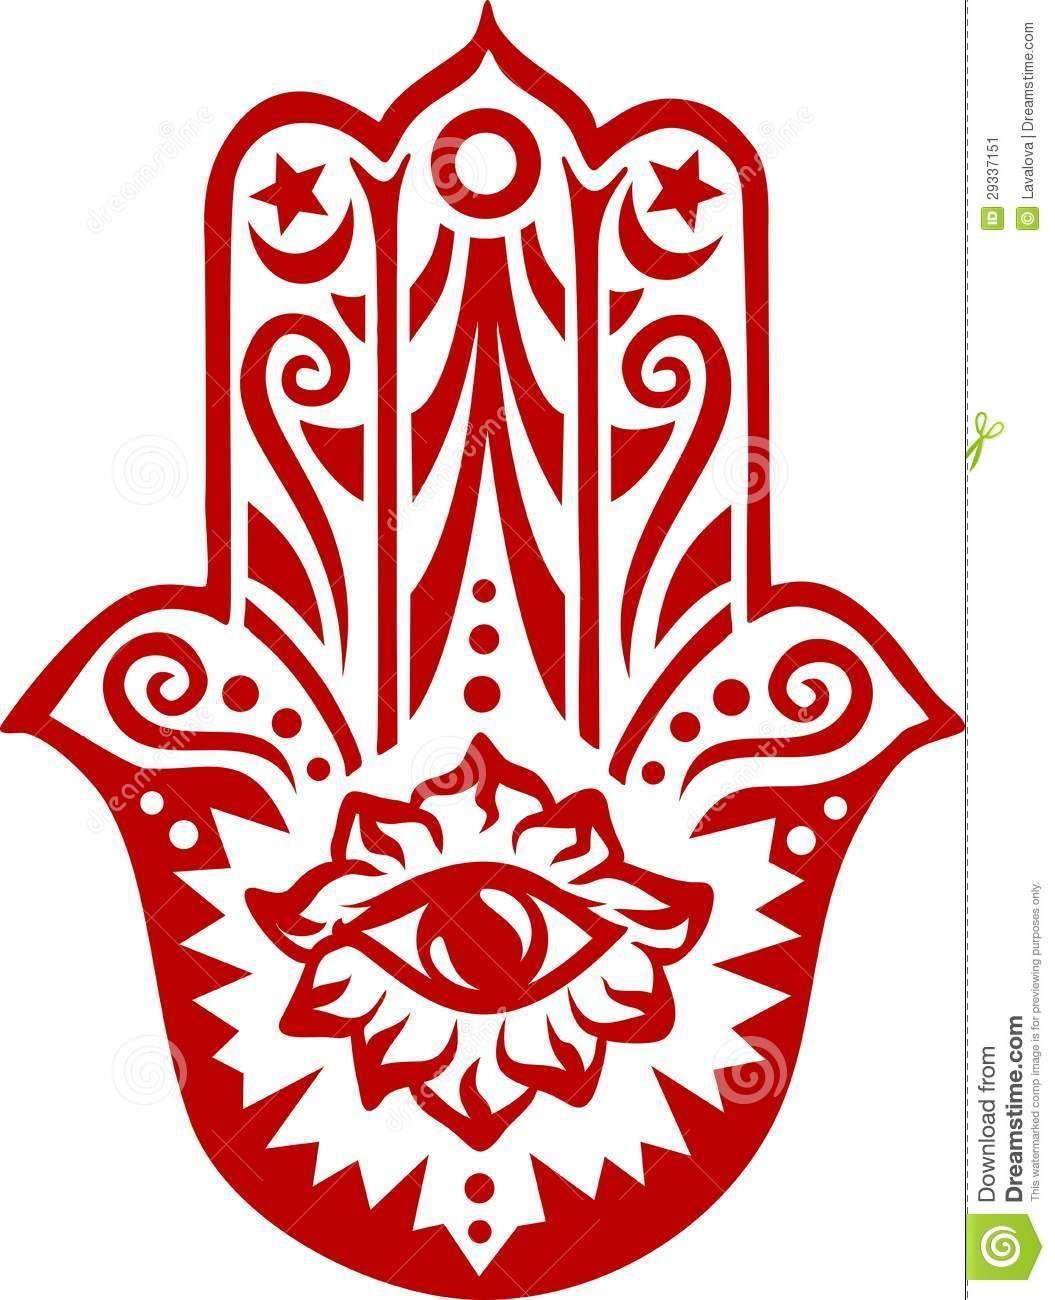 Hamsa hand of fatima protection amulet stock image image 2c2986539ac047b01f1e19dac4049c09g biocorpaavc